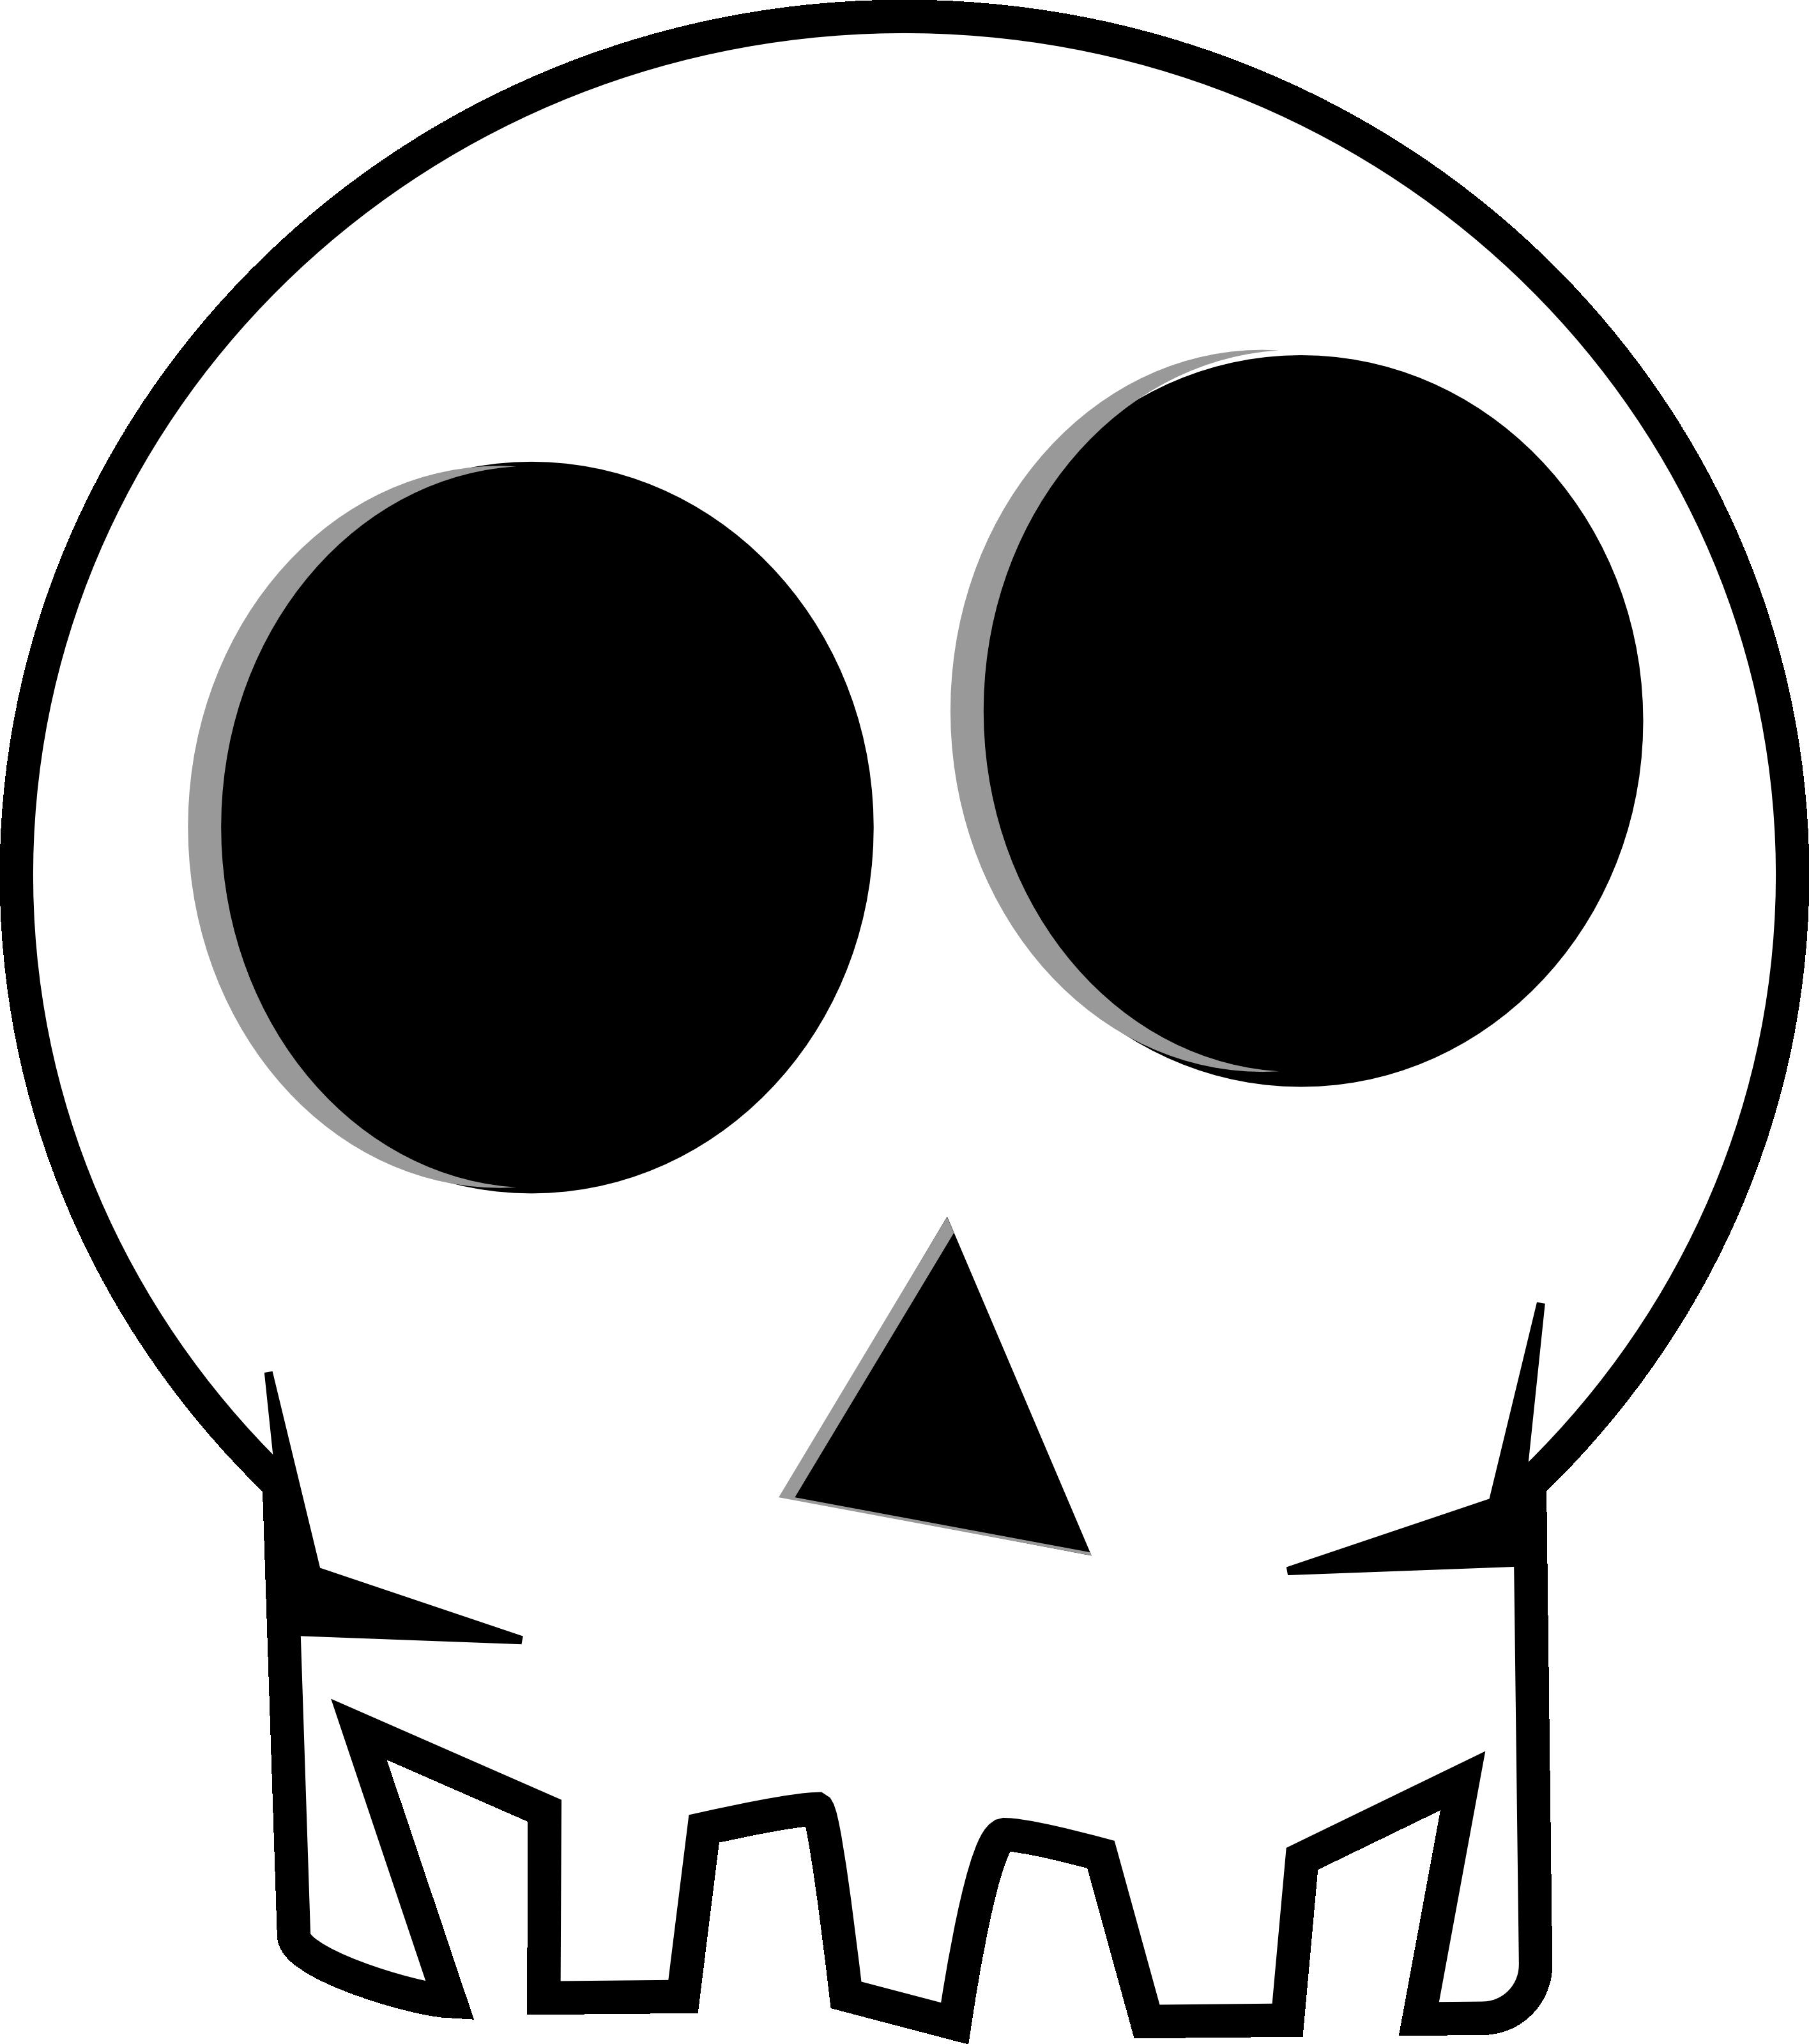 Huge Eye Socketed Skull - Free Halloween Vector Clipart Illustration ...